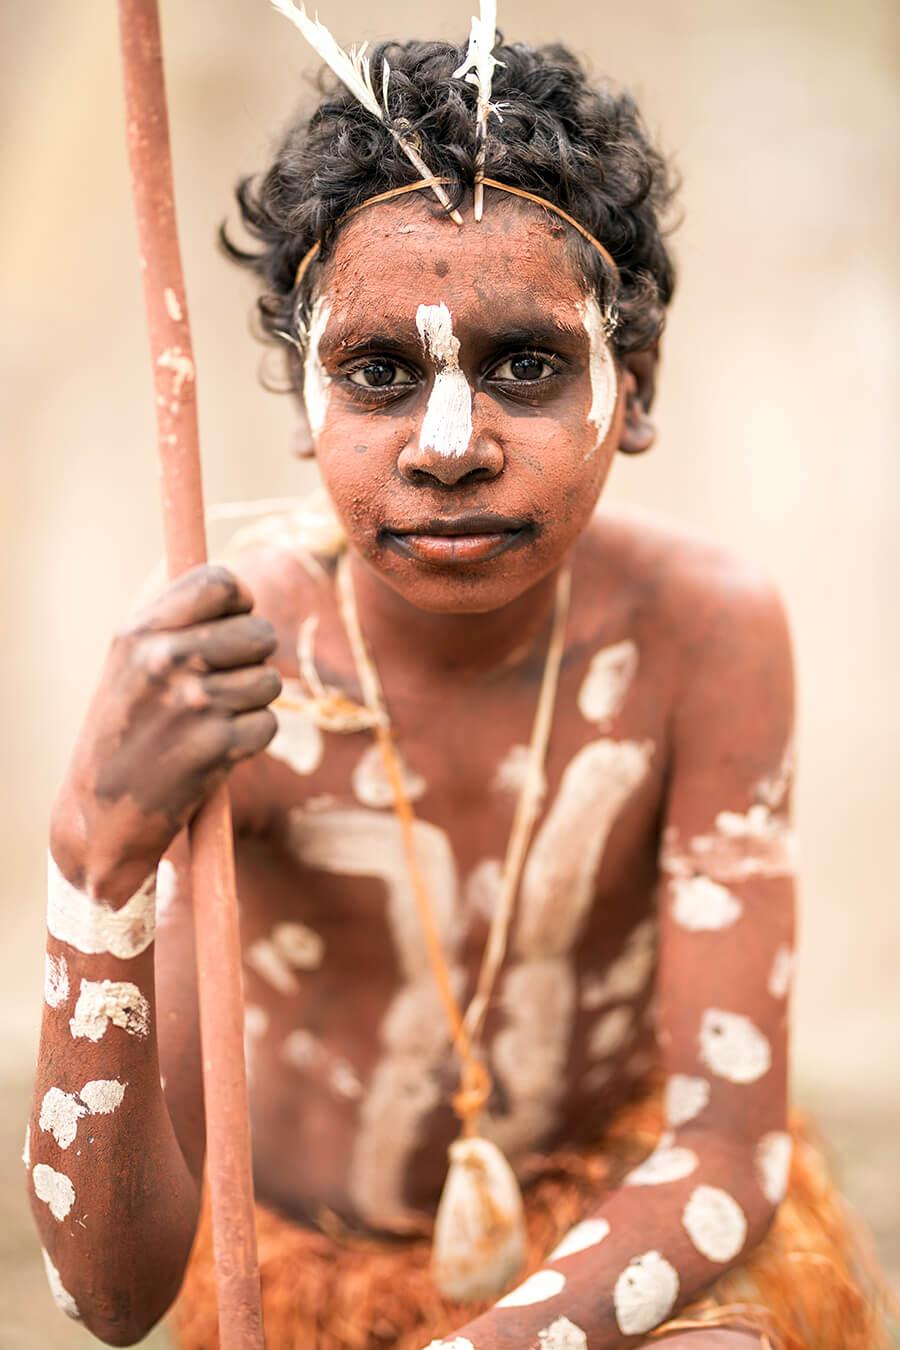 Мальчик из аборигенского поселения Пормпуурау, Австралия, п-ов Кейп-Йорк © Александр Химушин / The World In Faces